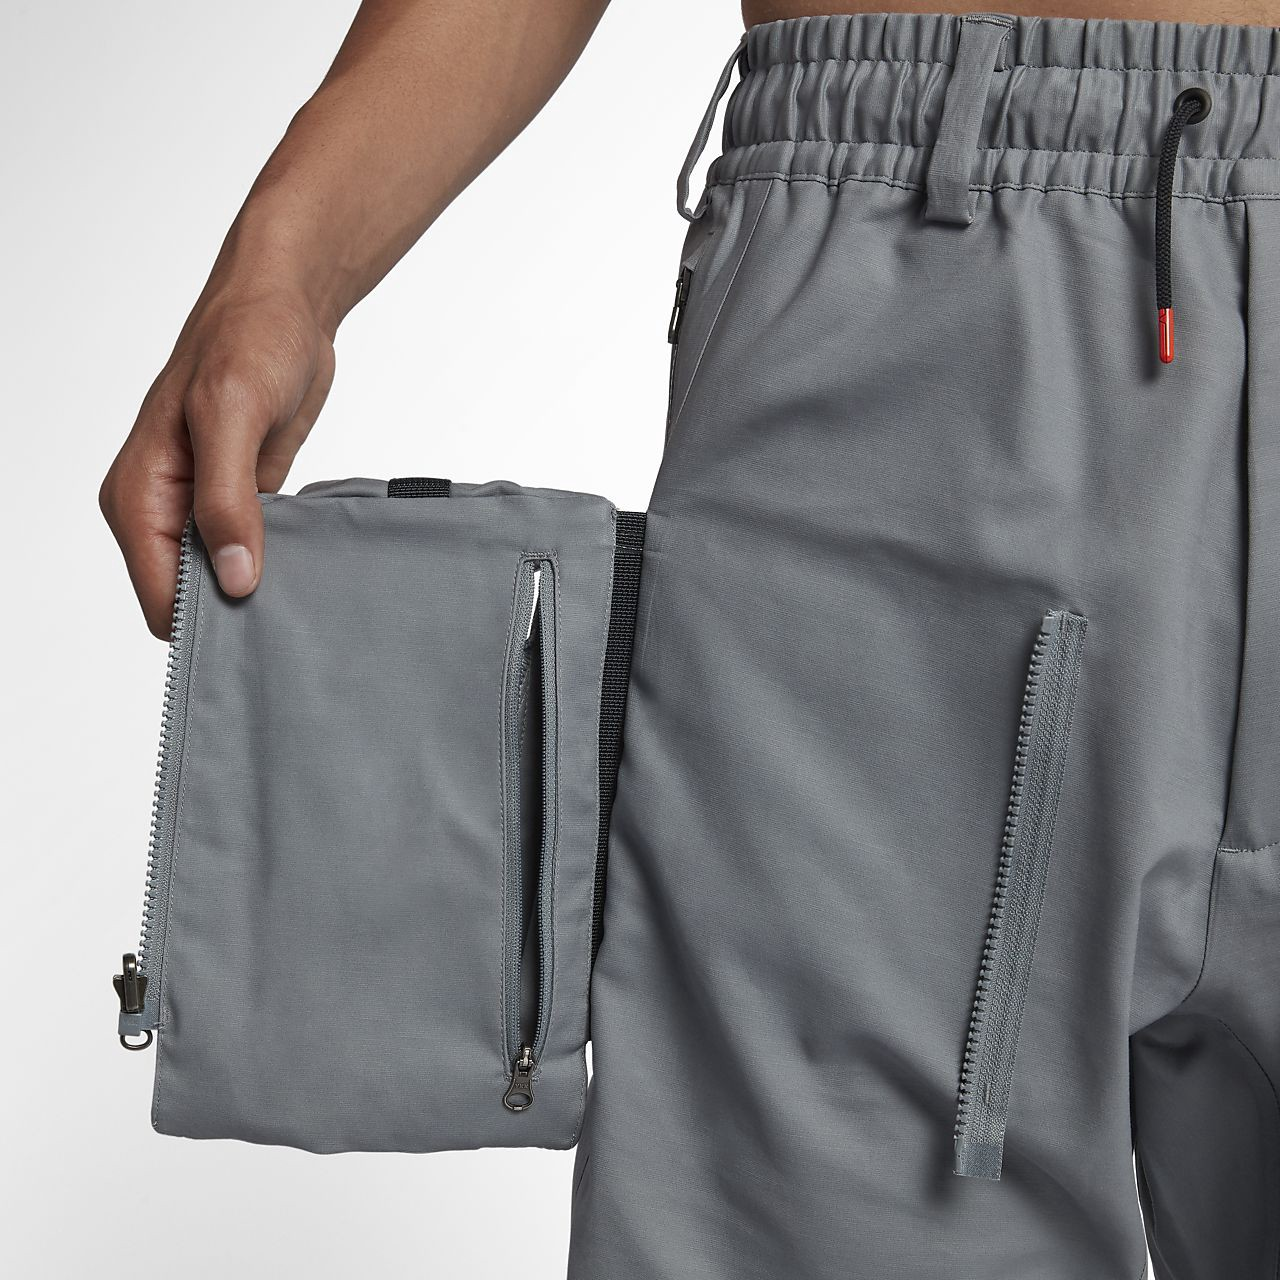 f2022b1358 Nike Lab Acg Deploy Men's Cargo Shorts - S Grey | Products | Cargo ...